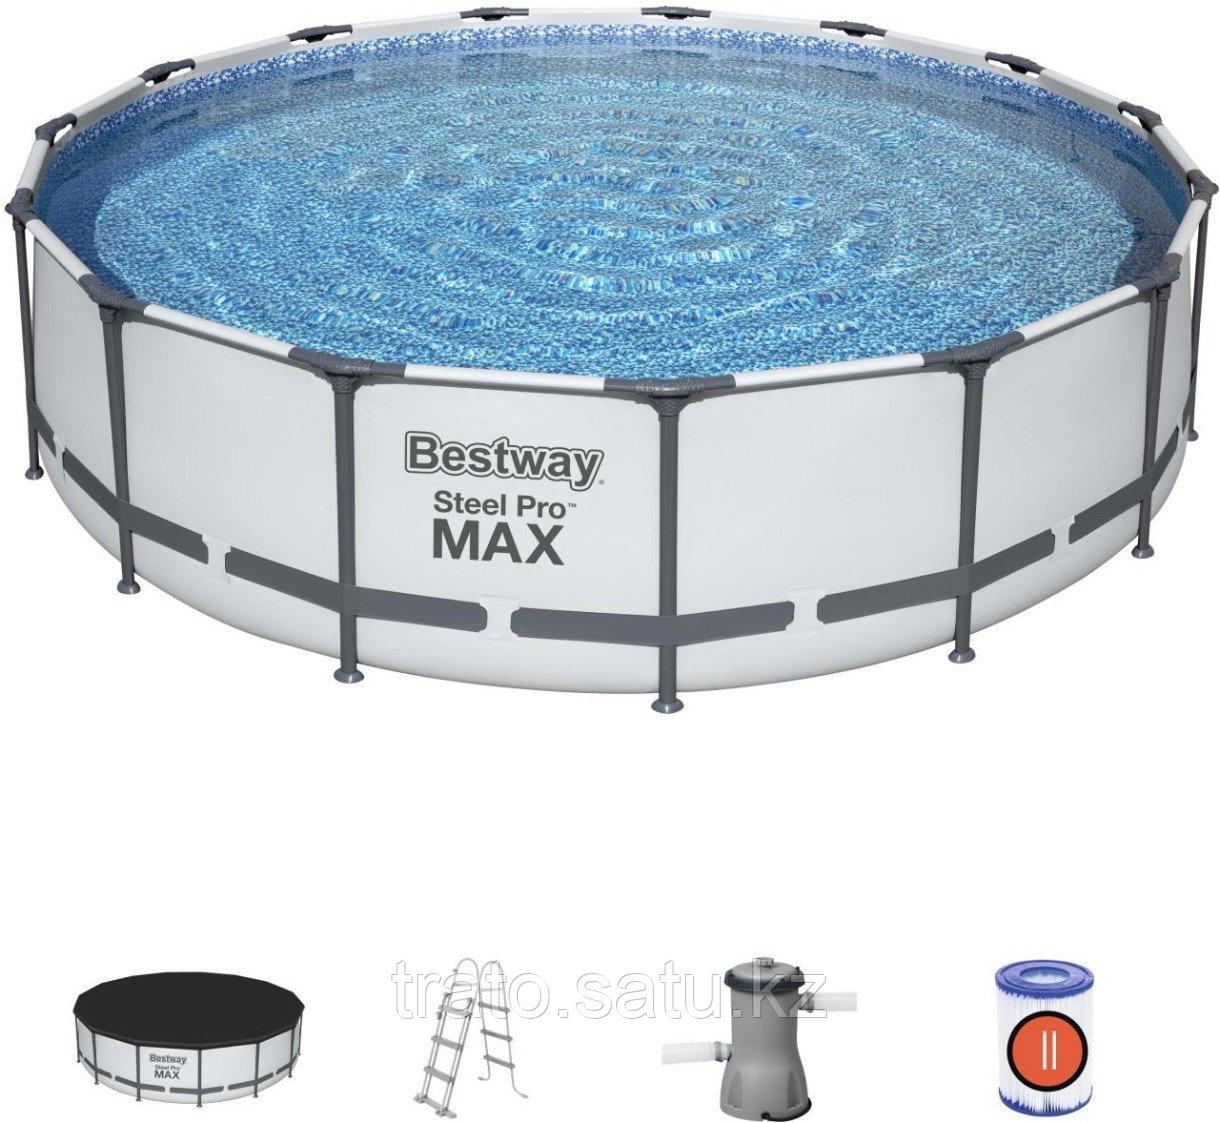 Каркасный бассейн Steel Pro MAX 457 х 107 см. Ф-насос 3028л/ч, Лестница, Тент